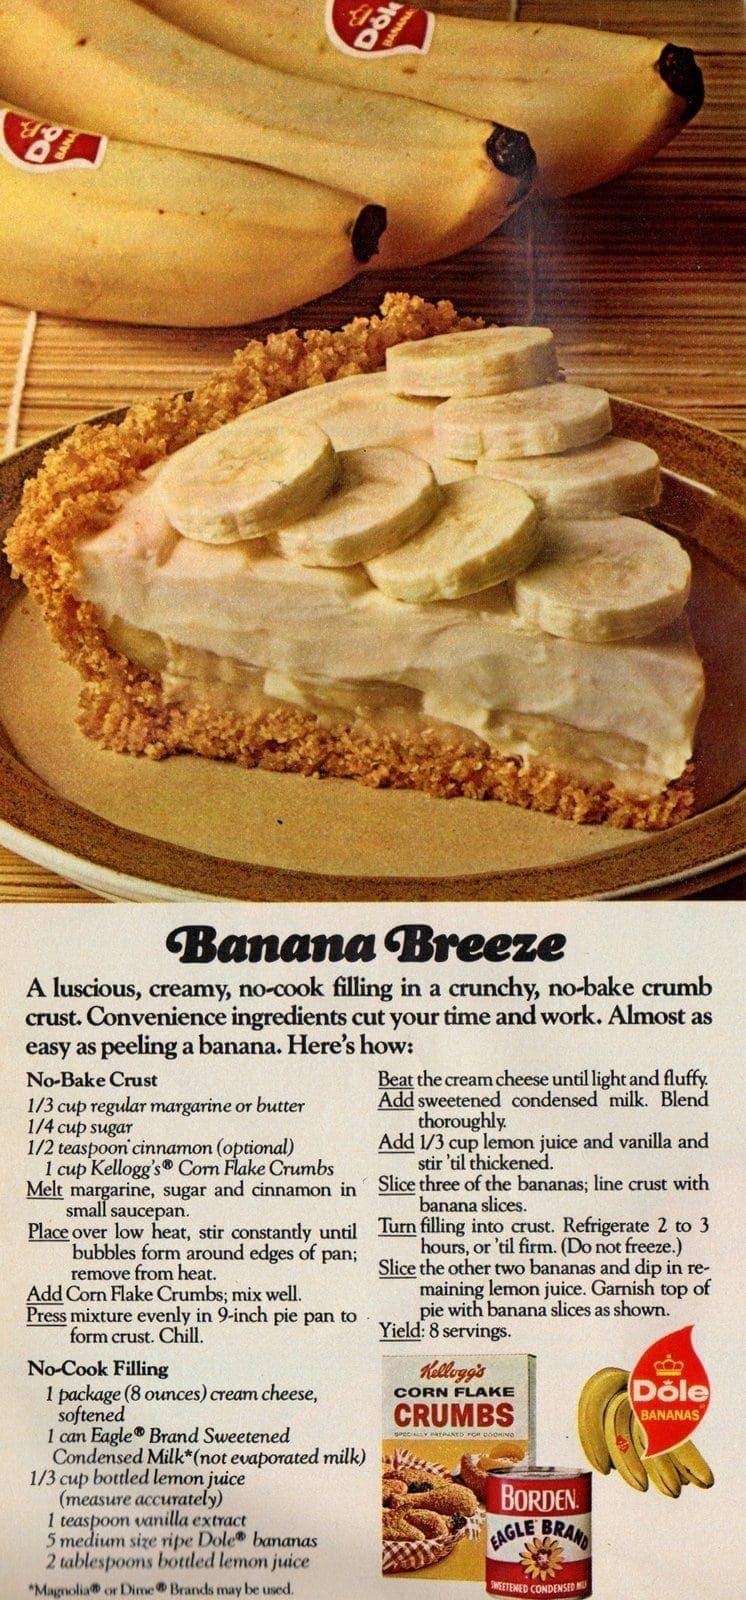 1974 Banana Breeze pie recipe